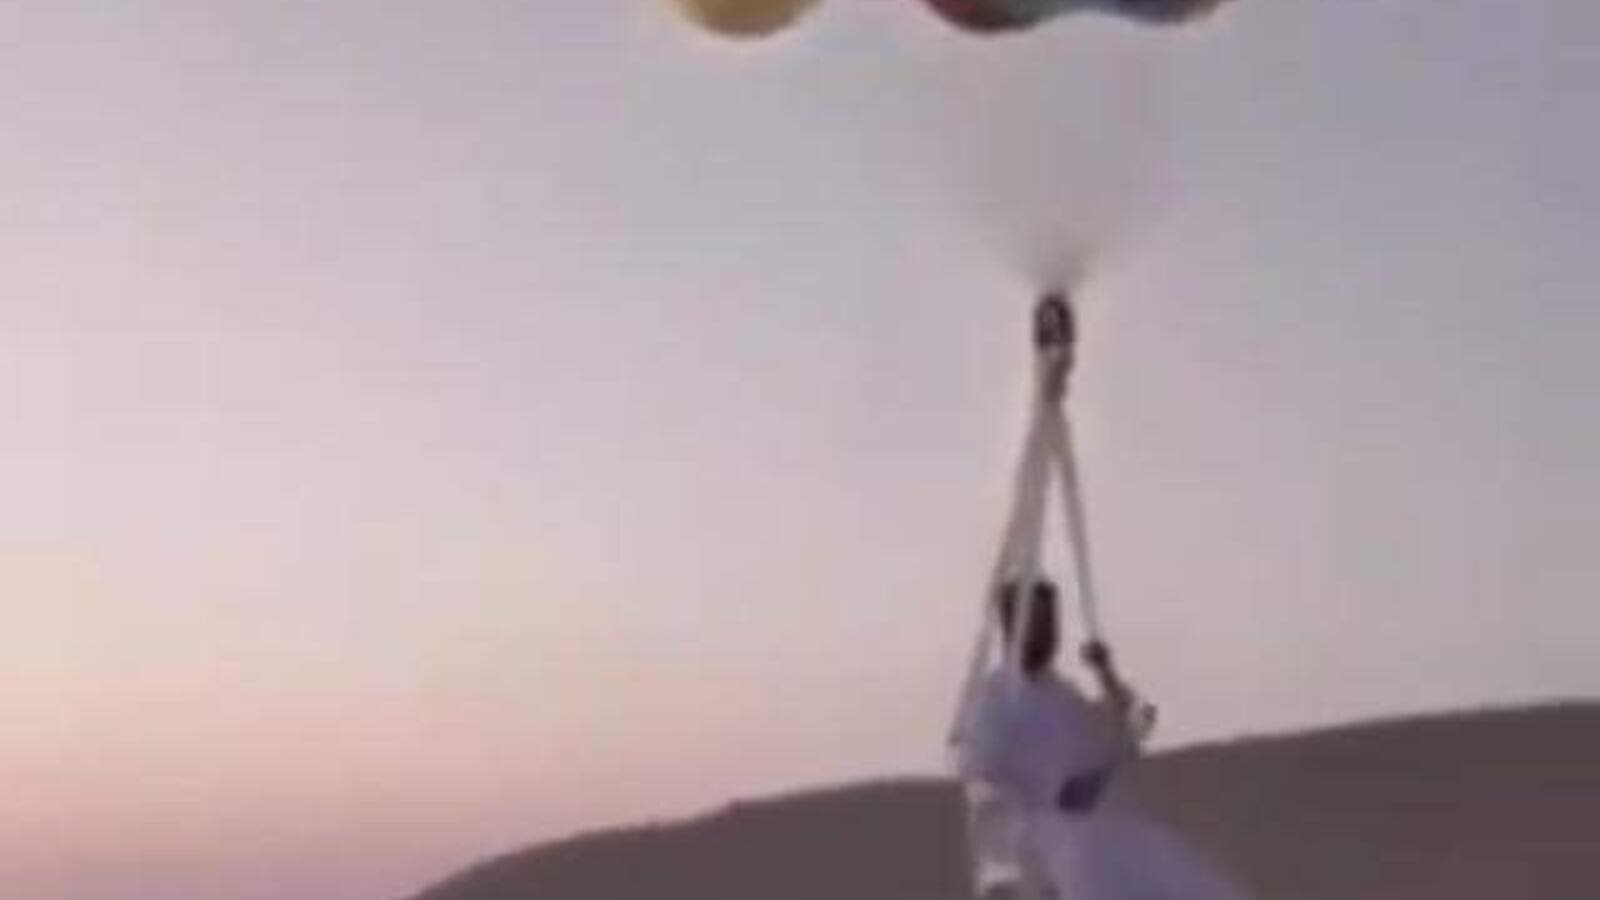 Khaleeji Boy Drifts Away on Balloons in Oman | Al Bawaba